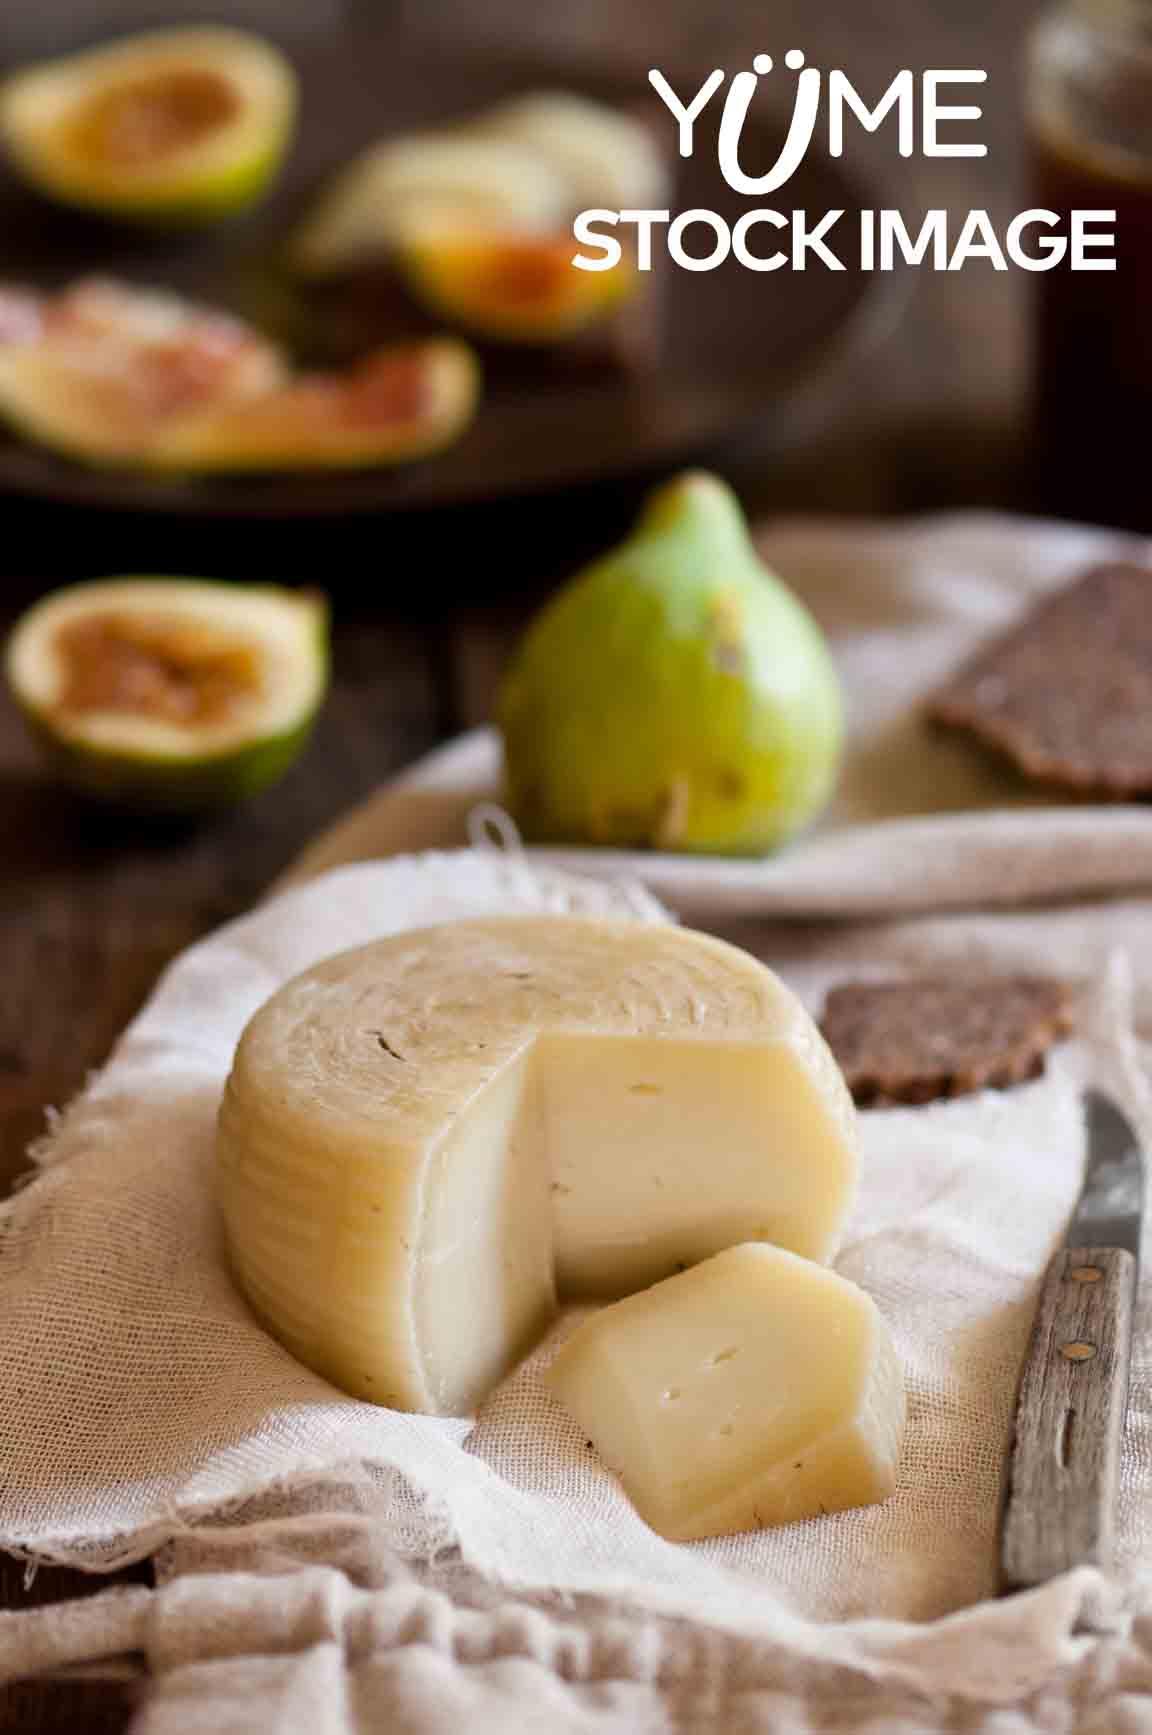 Cheese Slices Tasty, 8 x 1.5kg Blocks